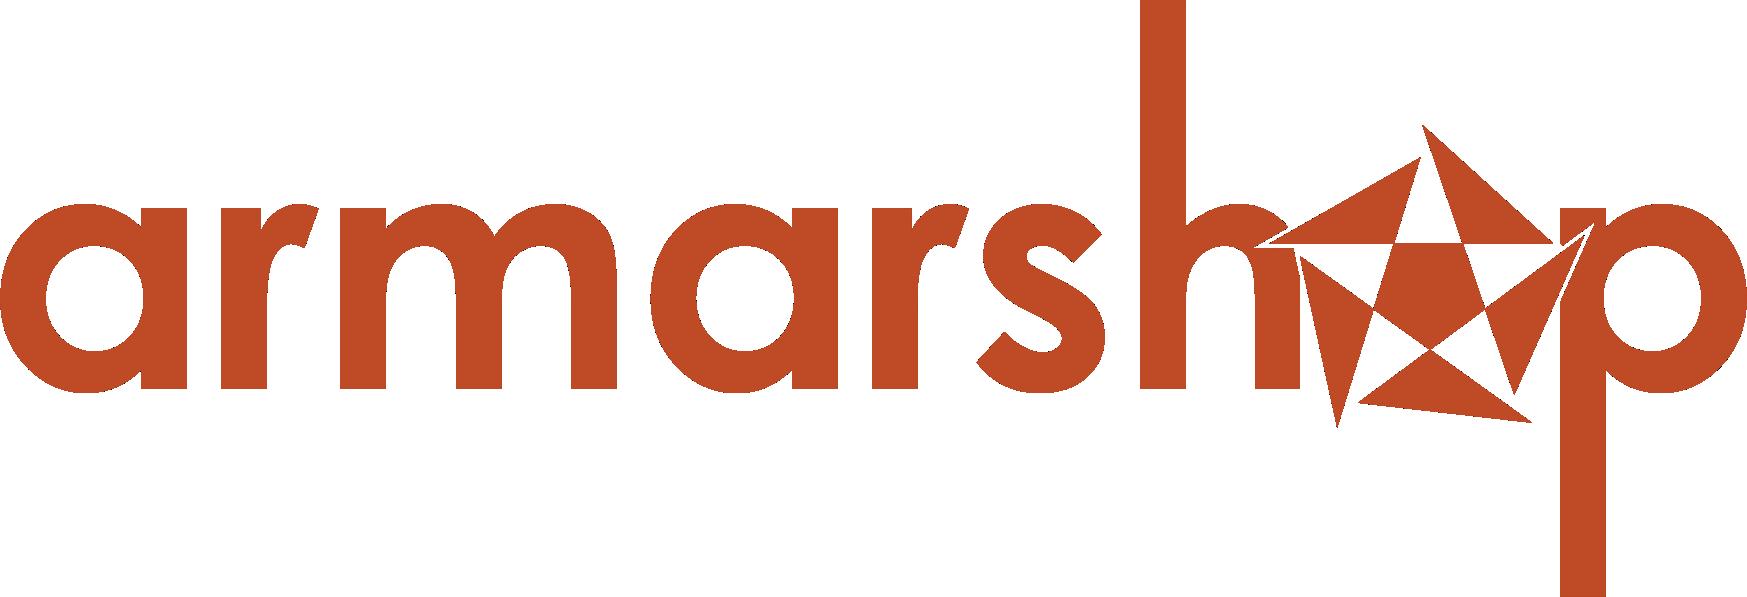 ArmarShop.com | Deðiþim Evinizde Baþlar